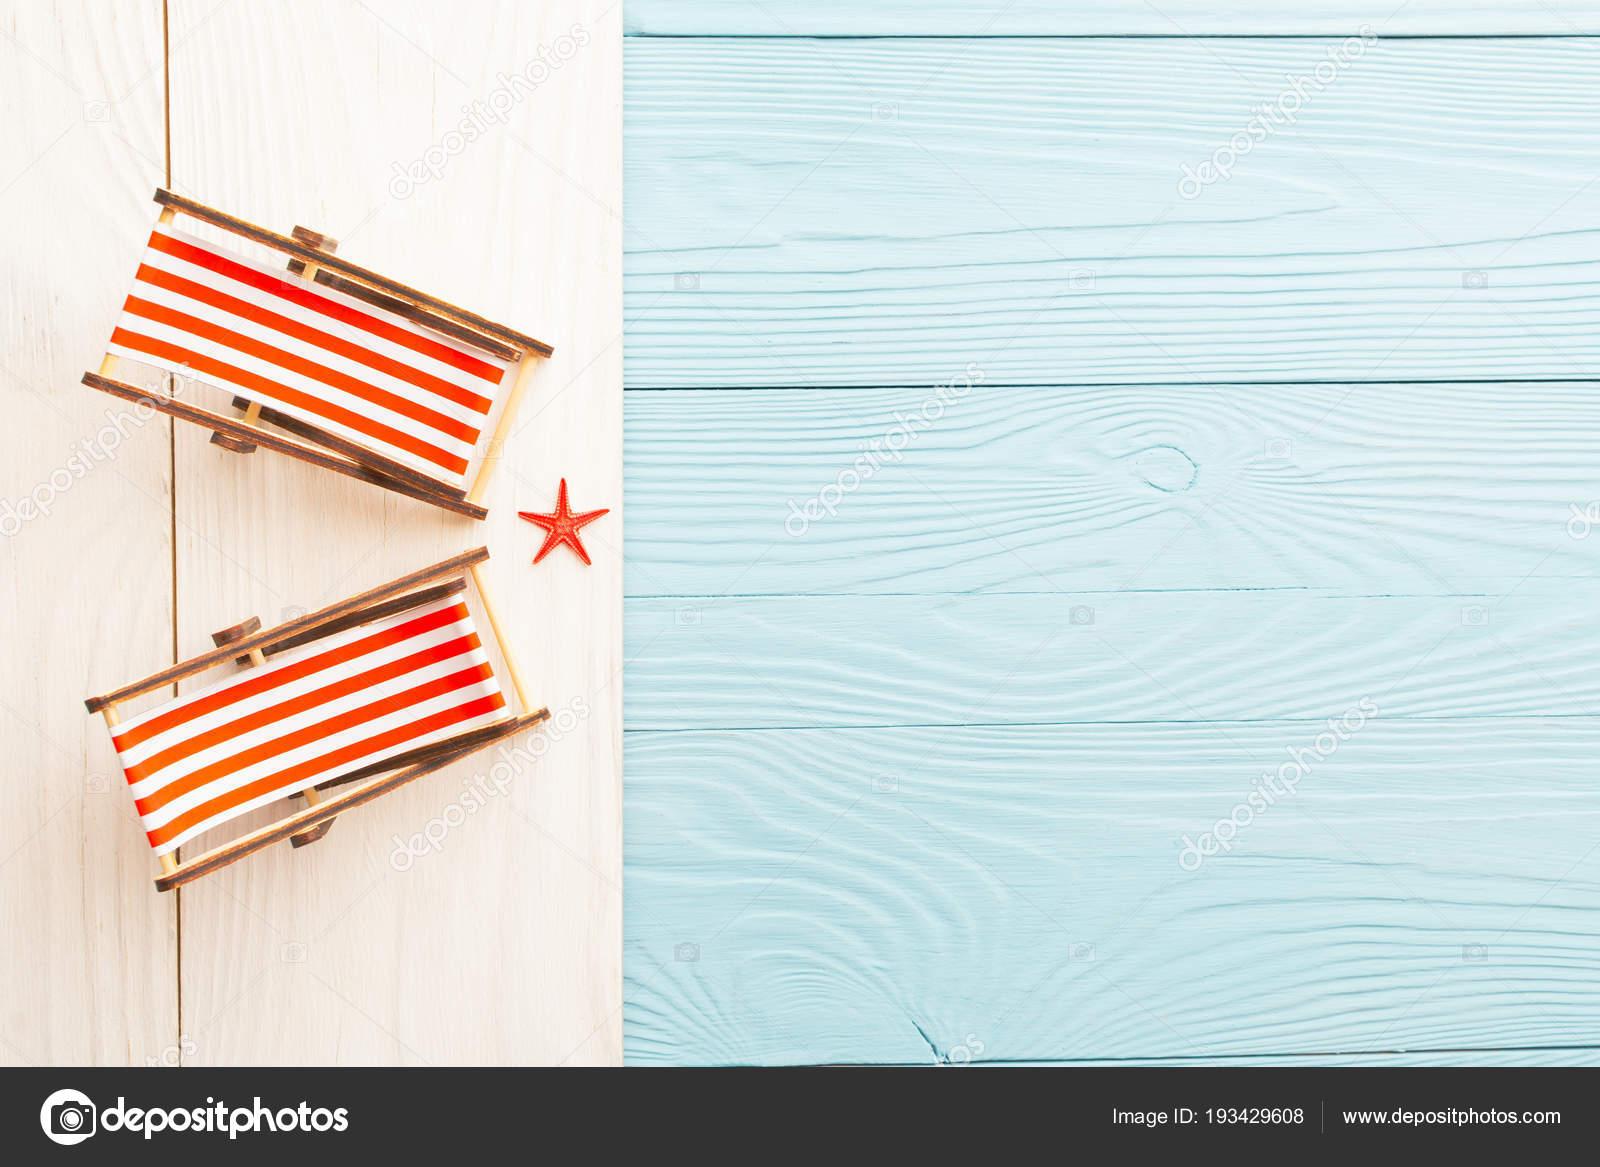 Sedie A Sdraio In Miniatura.Miniatura Di Spiaggia Di Sfondi Colorati In Legno E Sedie A Sdraio